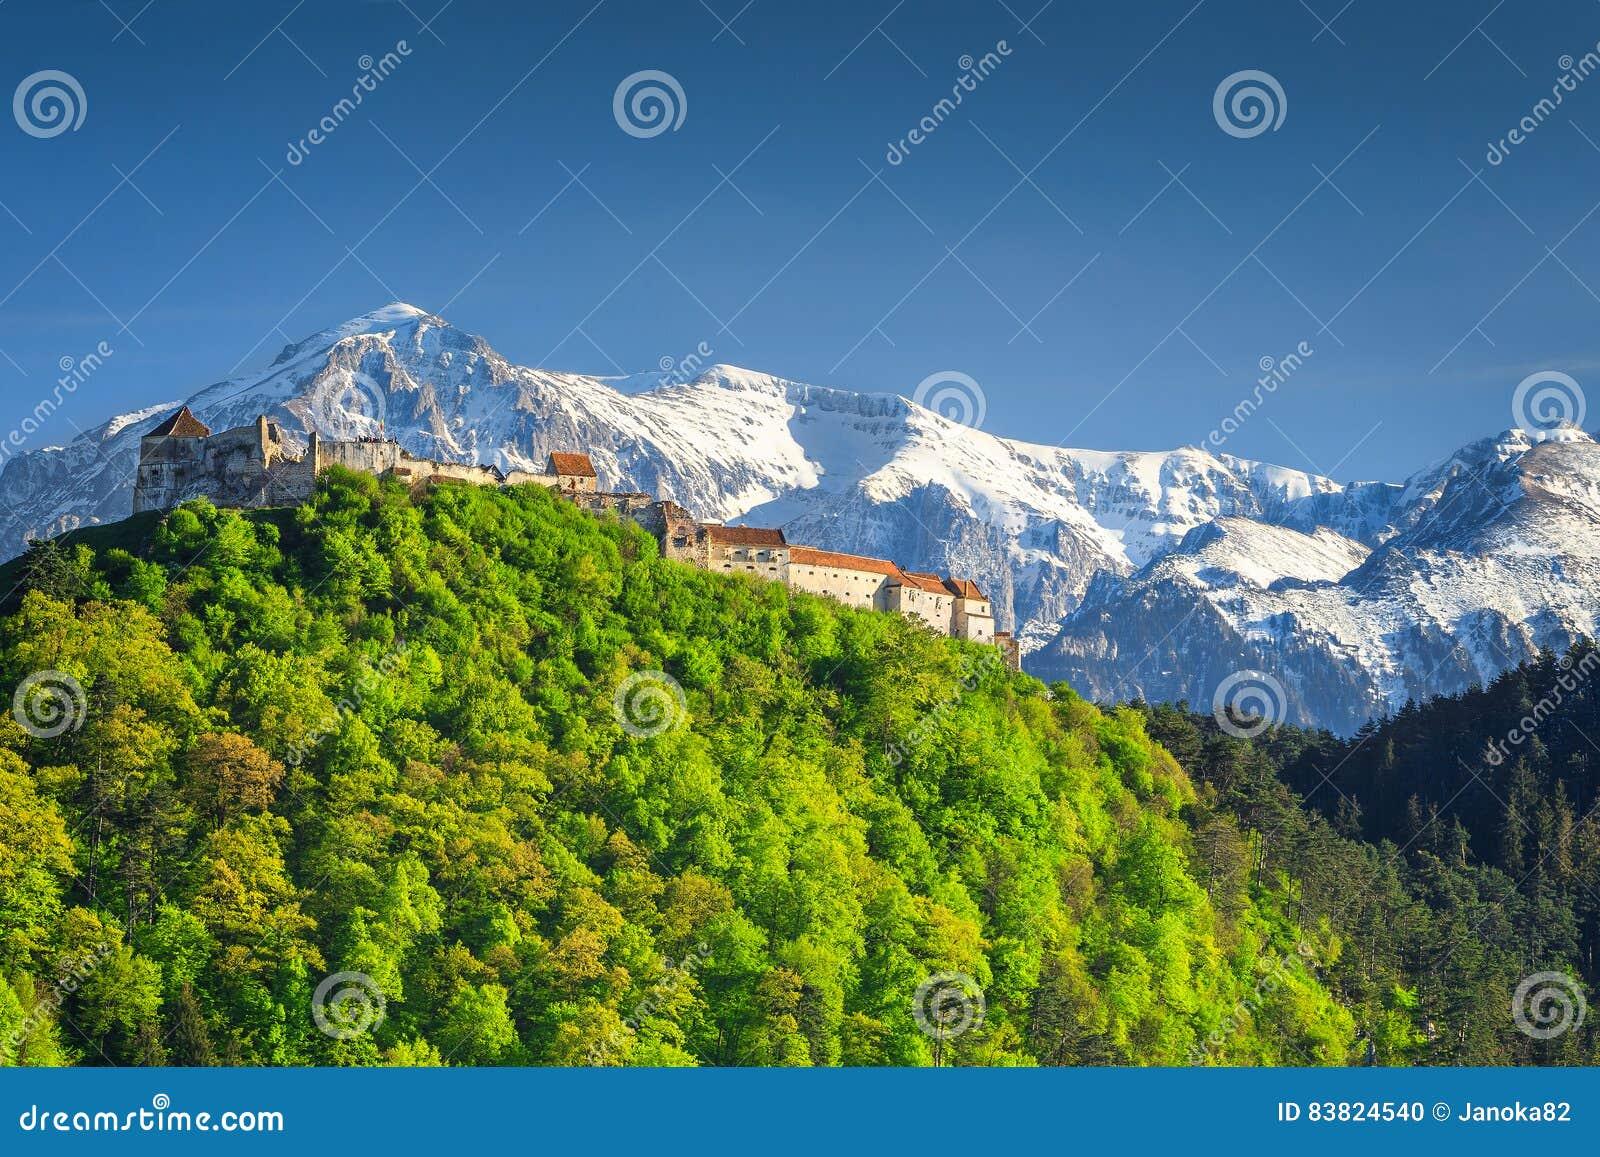 Spectacular medieval citadel in Rasnov city, Brasov region, Transylvania, Romania